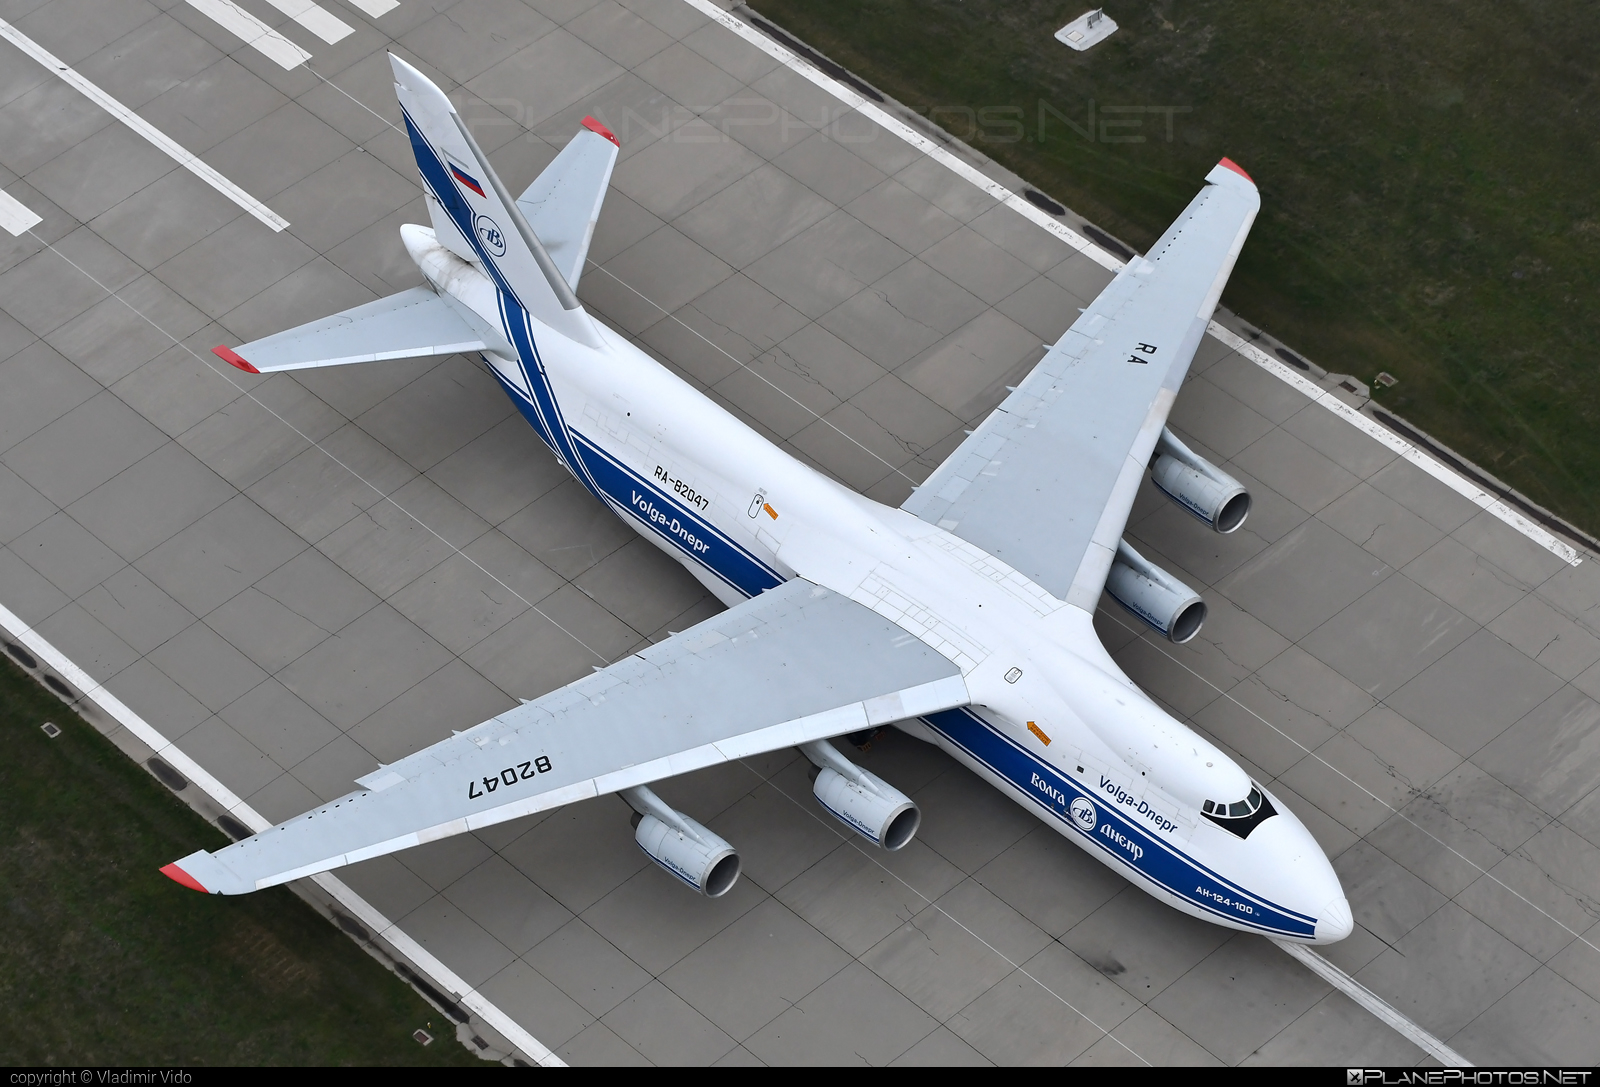 Antonov An-124-100 Ruslan - RA-82047 operated by Volga Dnepr Airlines #an124 #an124100 #an124100ruslan #an124ruslan #antonov #antonov124 #antonovan124